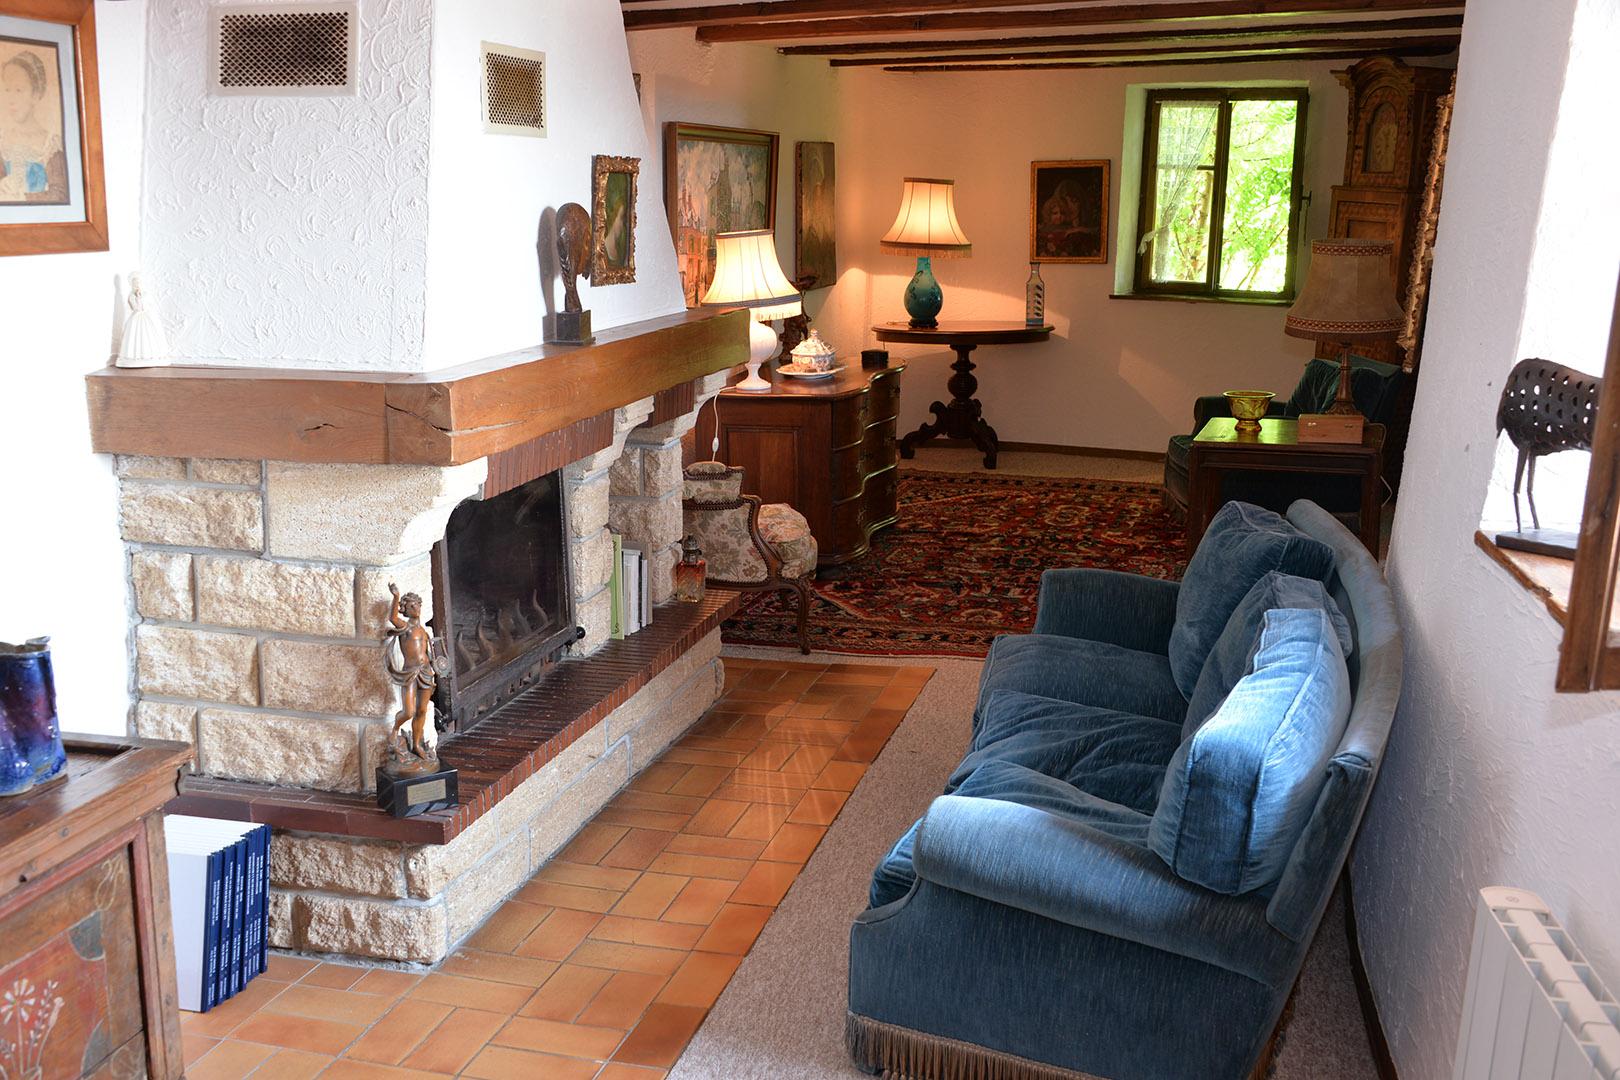 Meublé Jean Werner, Gueberschwihr, Pays de Rouffach, Vignobles et Châteaux, Haut-Rhin, Alsace